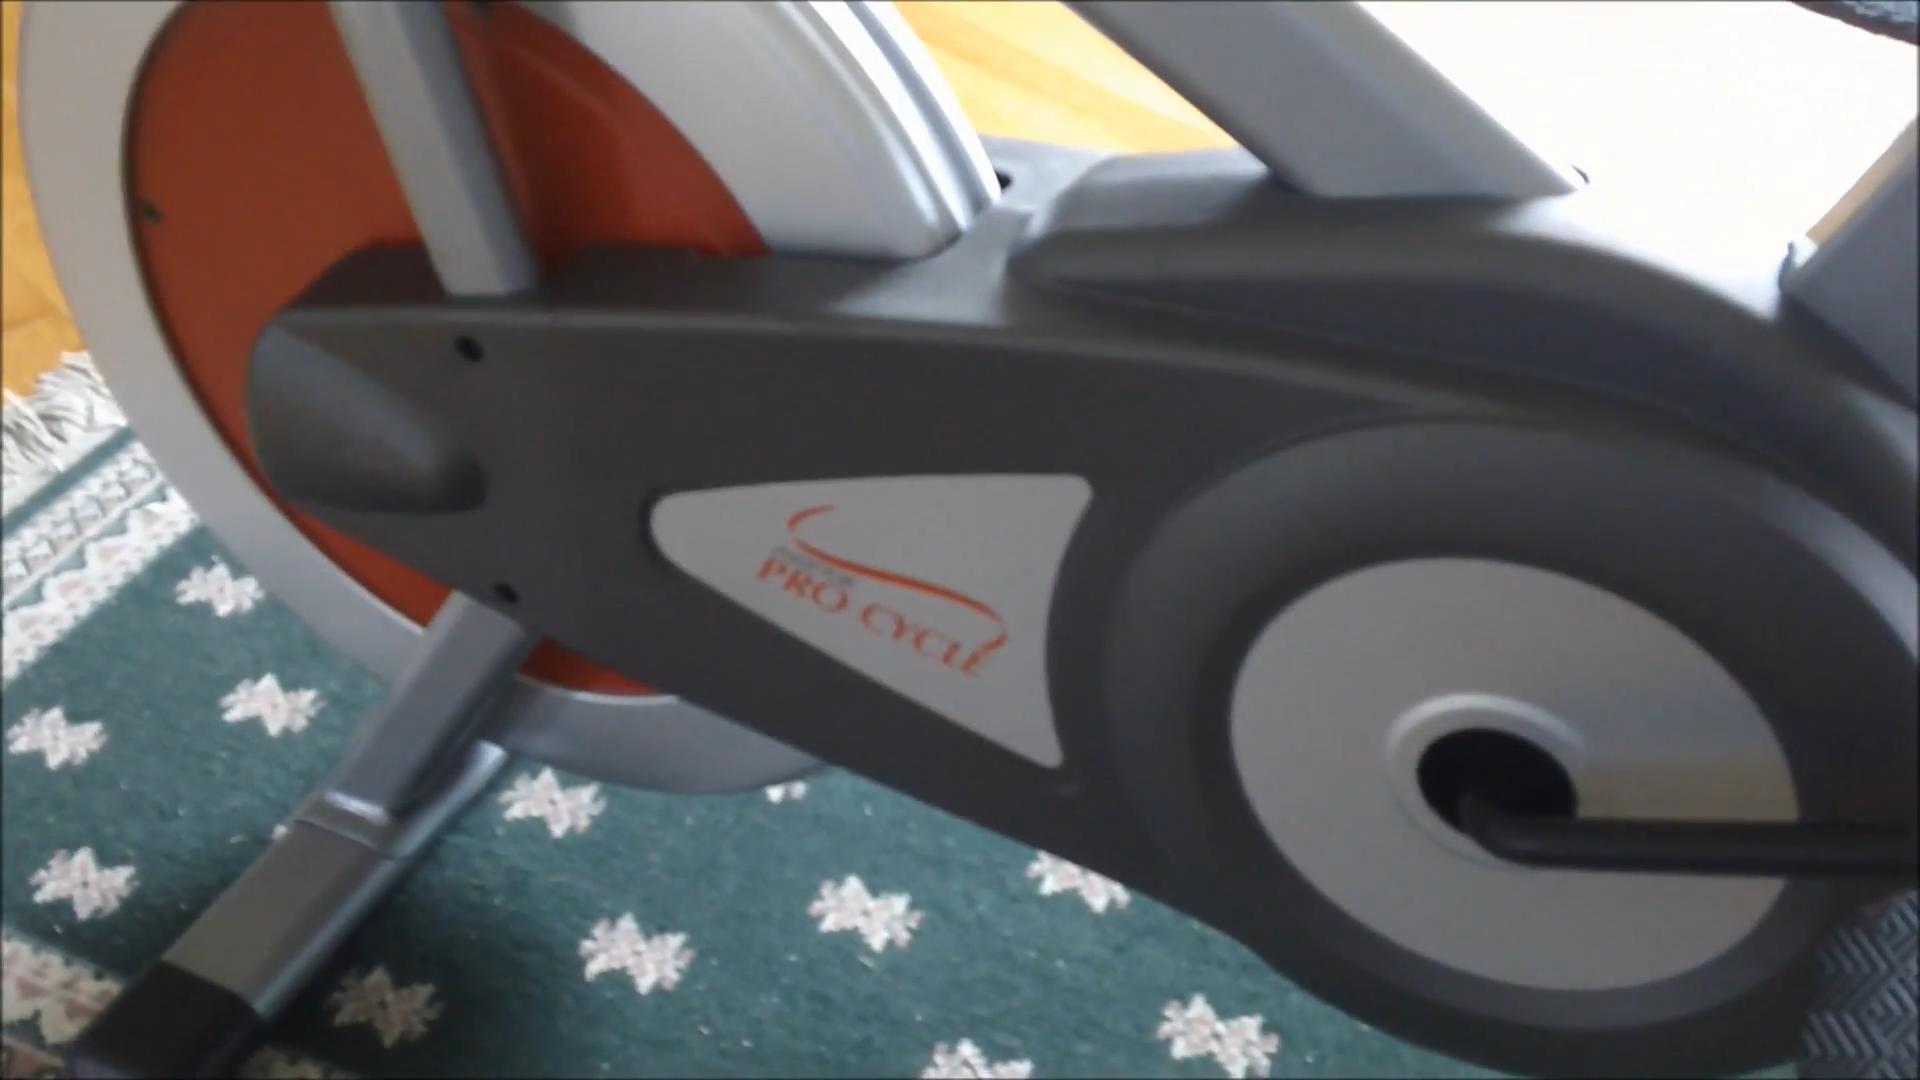 Stamina Conversion Ii Recumbent Exercise Bike Rower Stamina Air